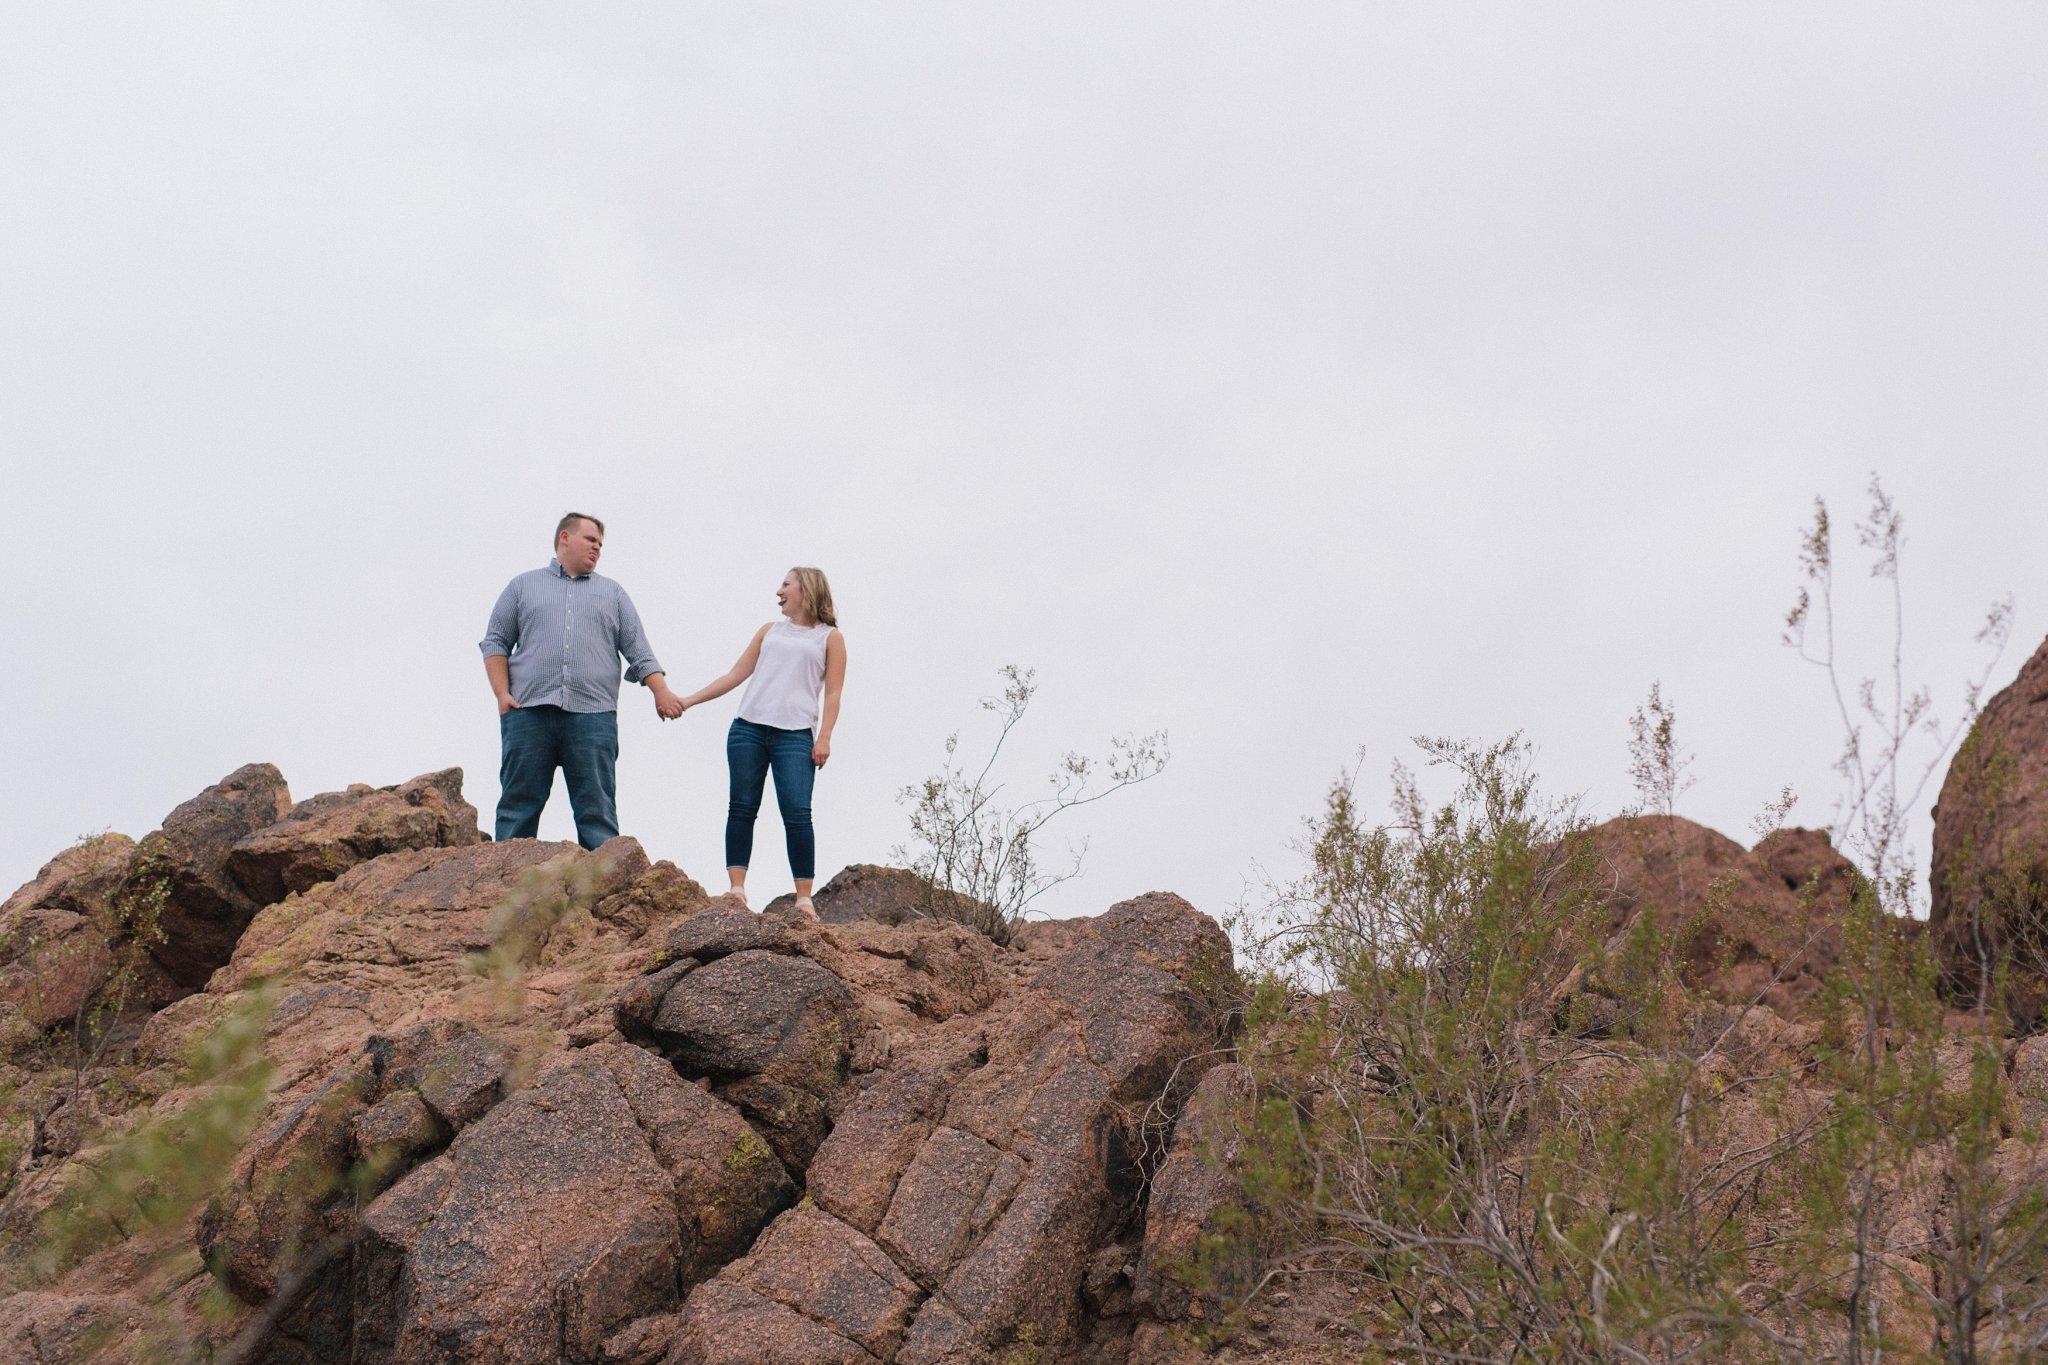 Tempe engagement photos in the desert